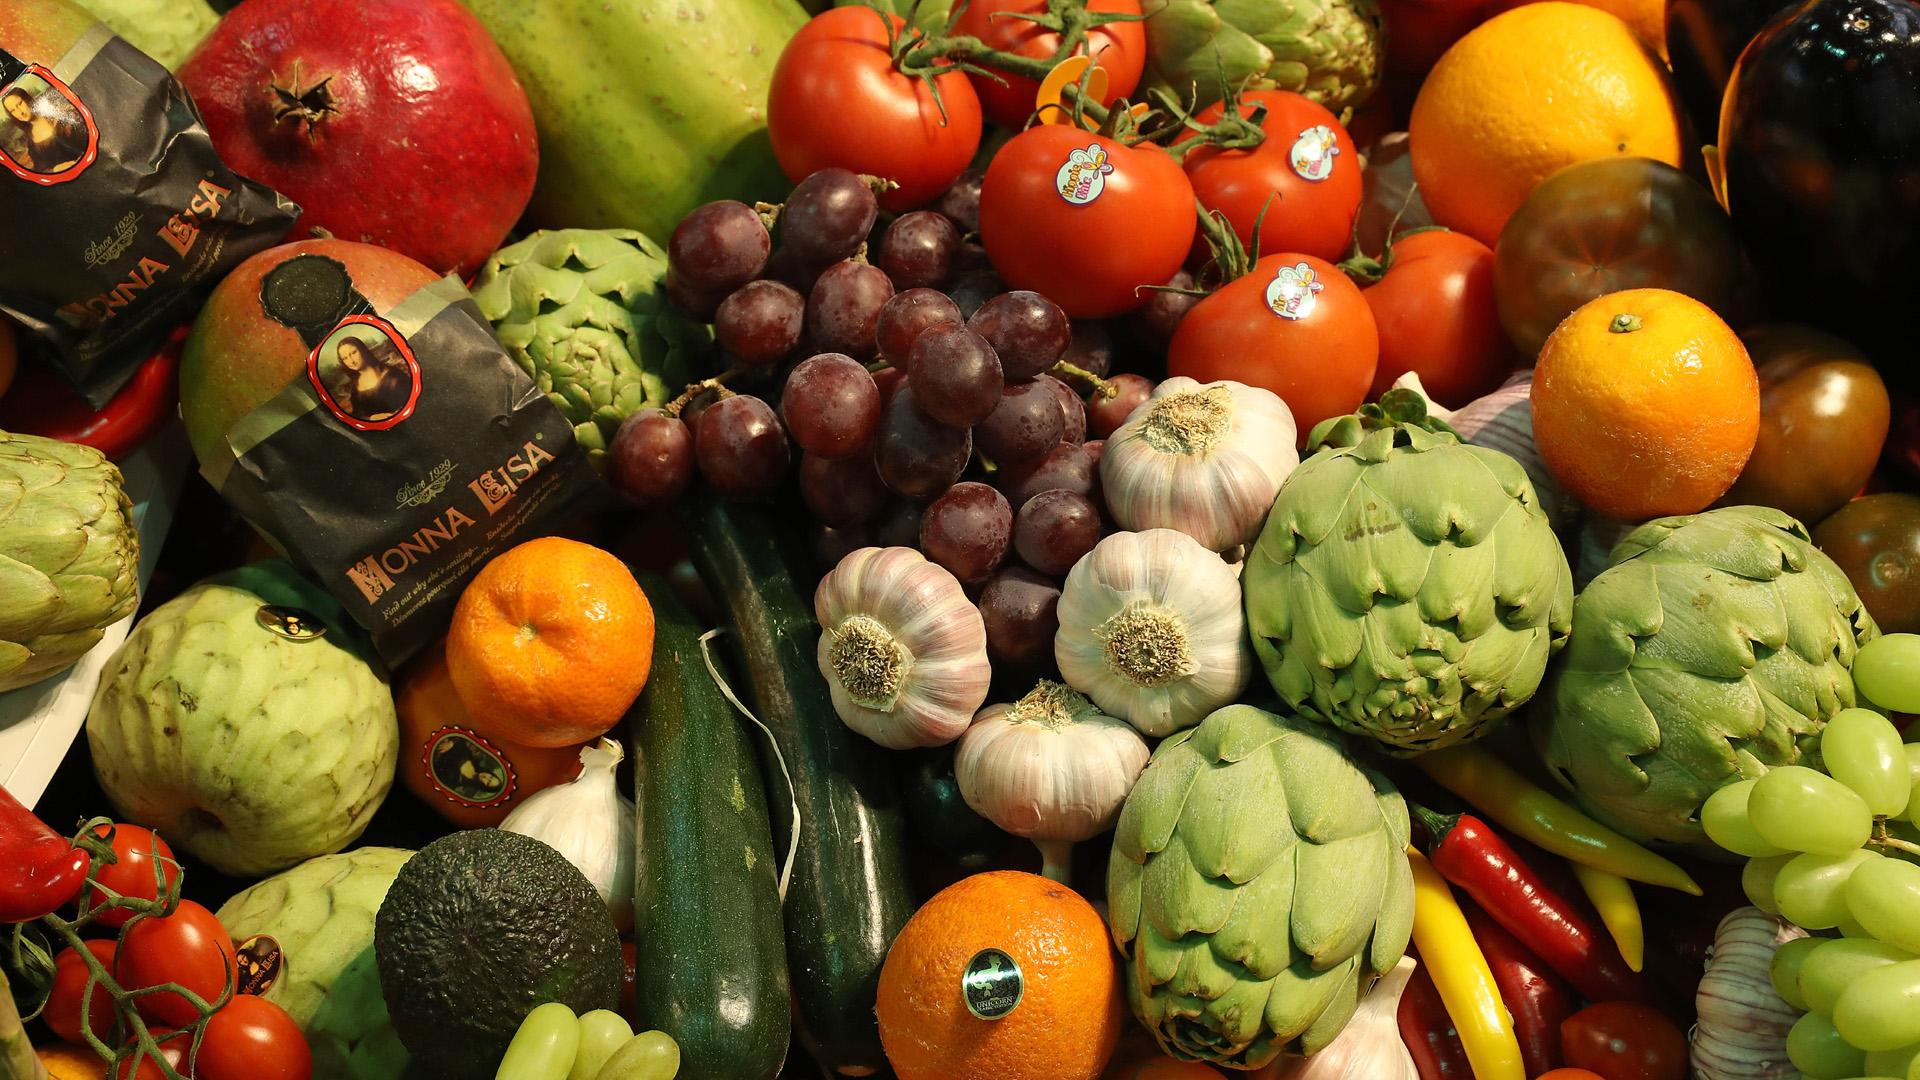 Fresh fruit, vegetables, veggies, whole foods, produce, tomatoes, artichokes, grapes, oranges, garlic, zucchini, avocado, pomegranate37510047-159532